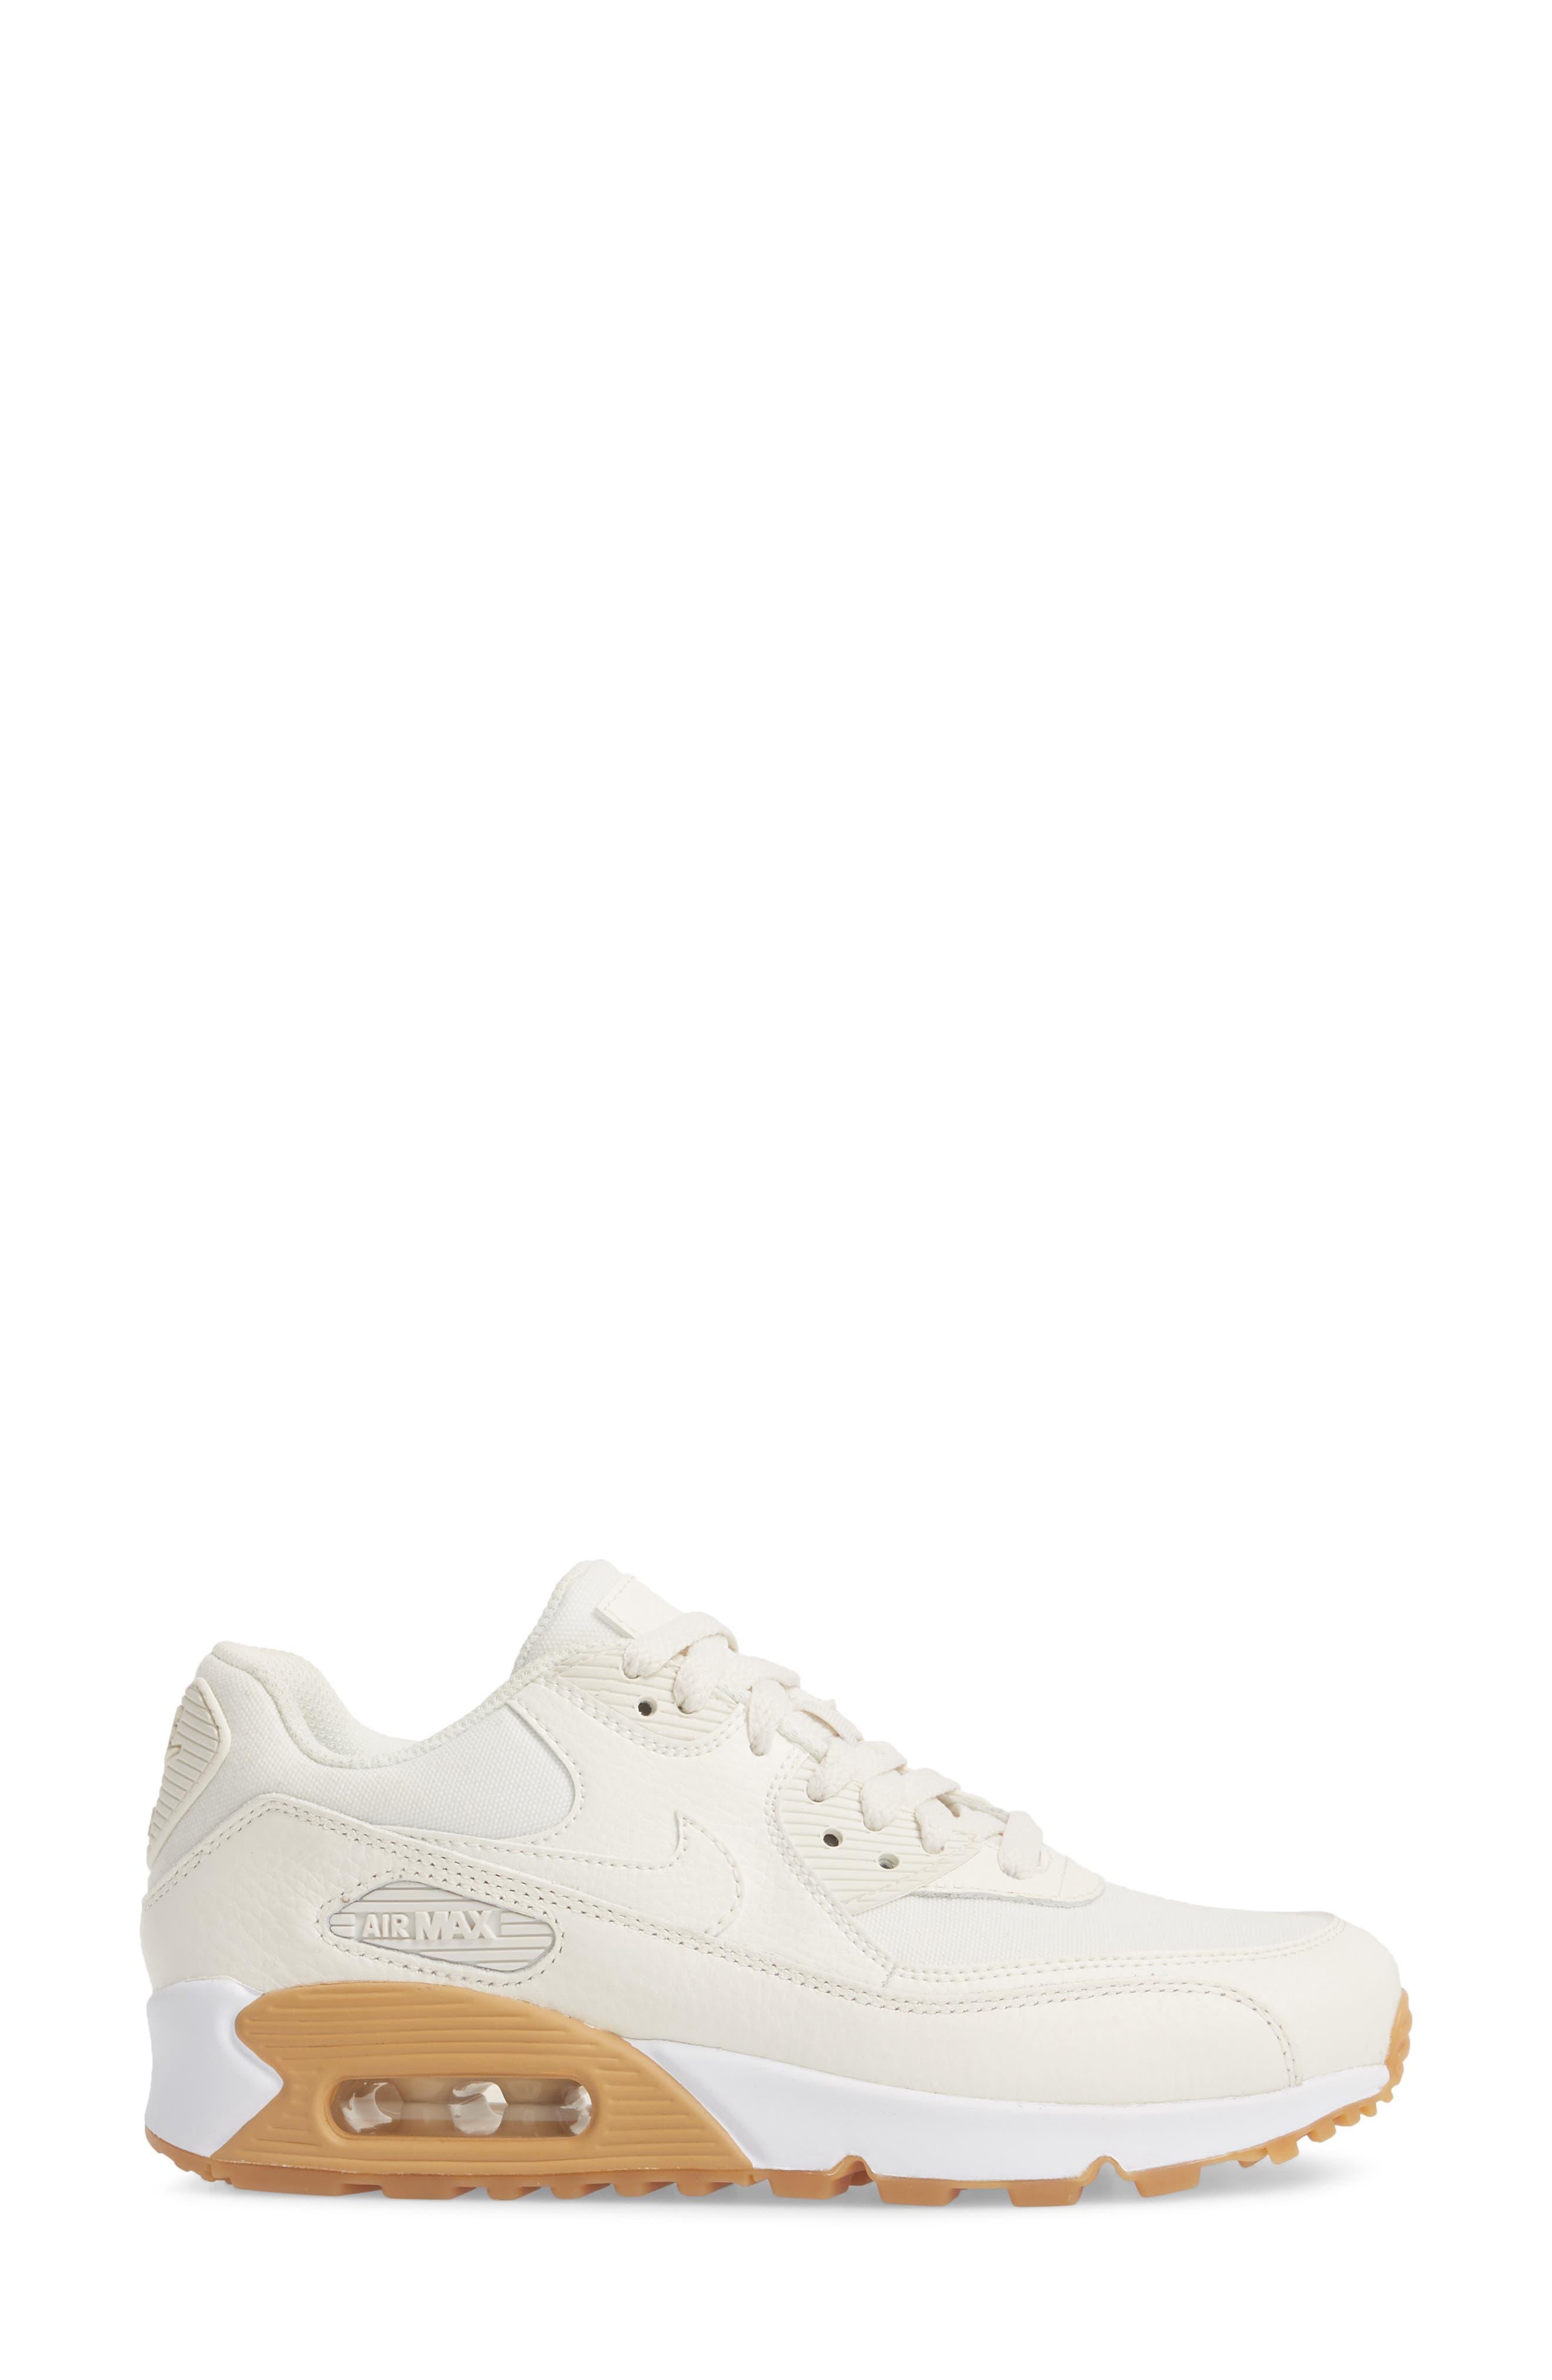 Air Max 90 Premium Sneaker,                             Alternate thumbnail 3, color,                             Sail/ Light Brown/ White